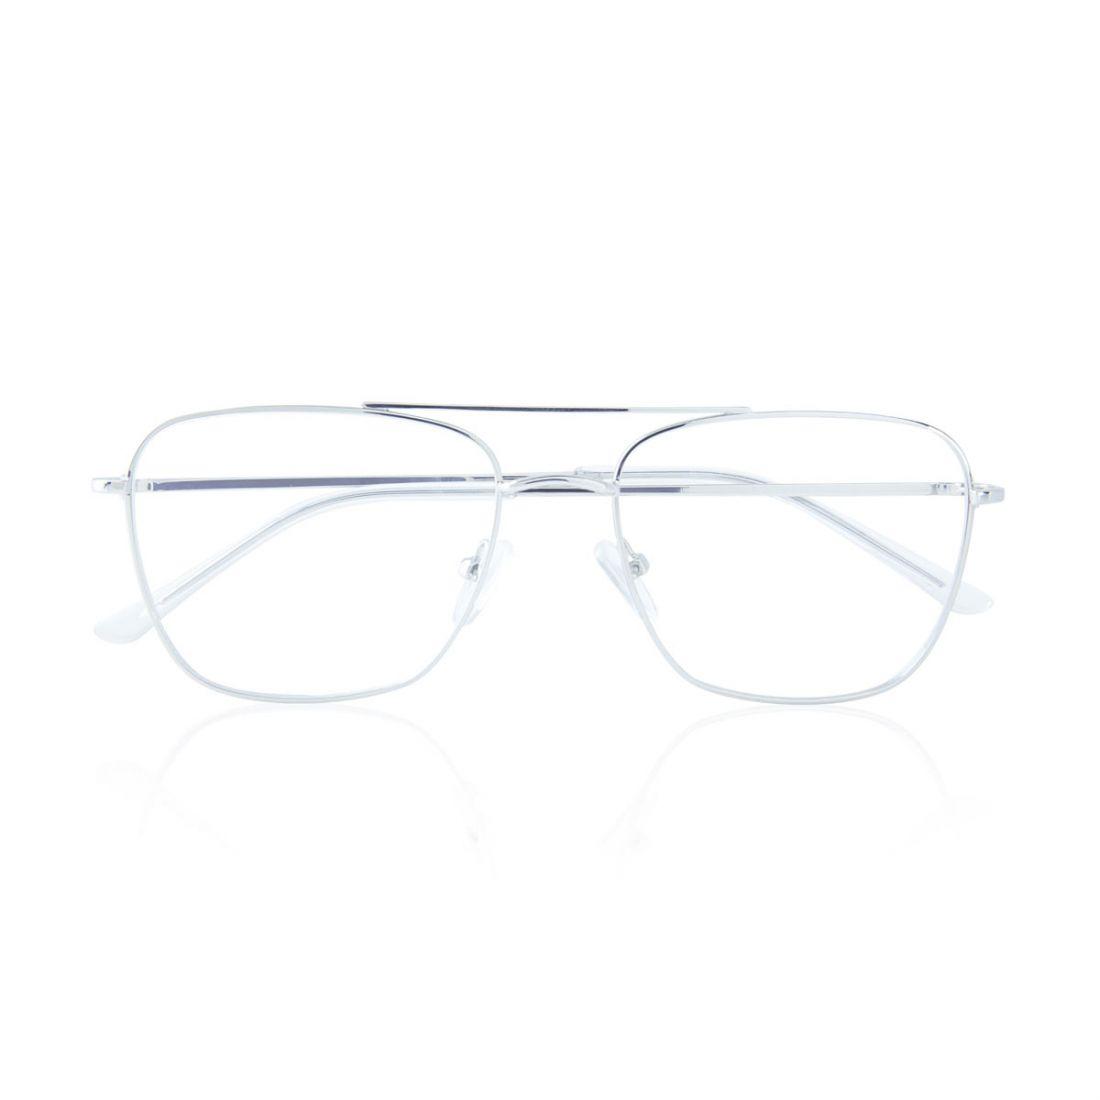 Occhiali da vista eleganti argentati 4FrhfF